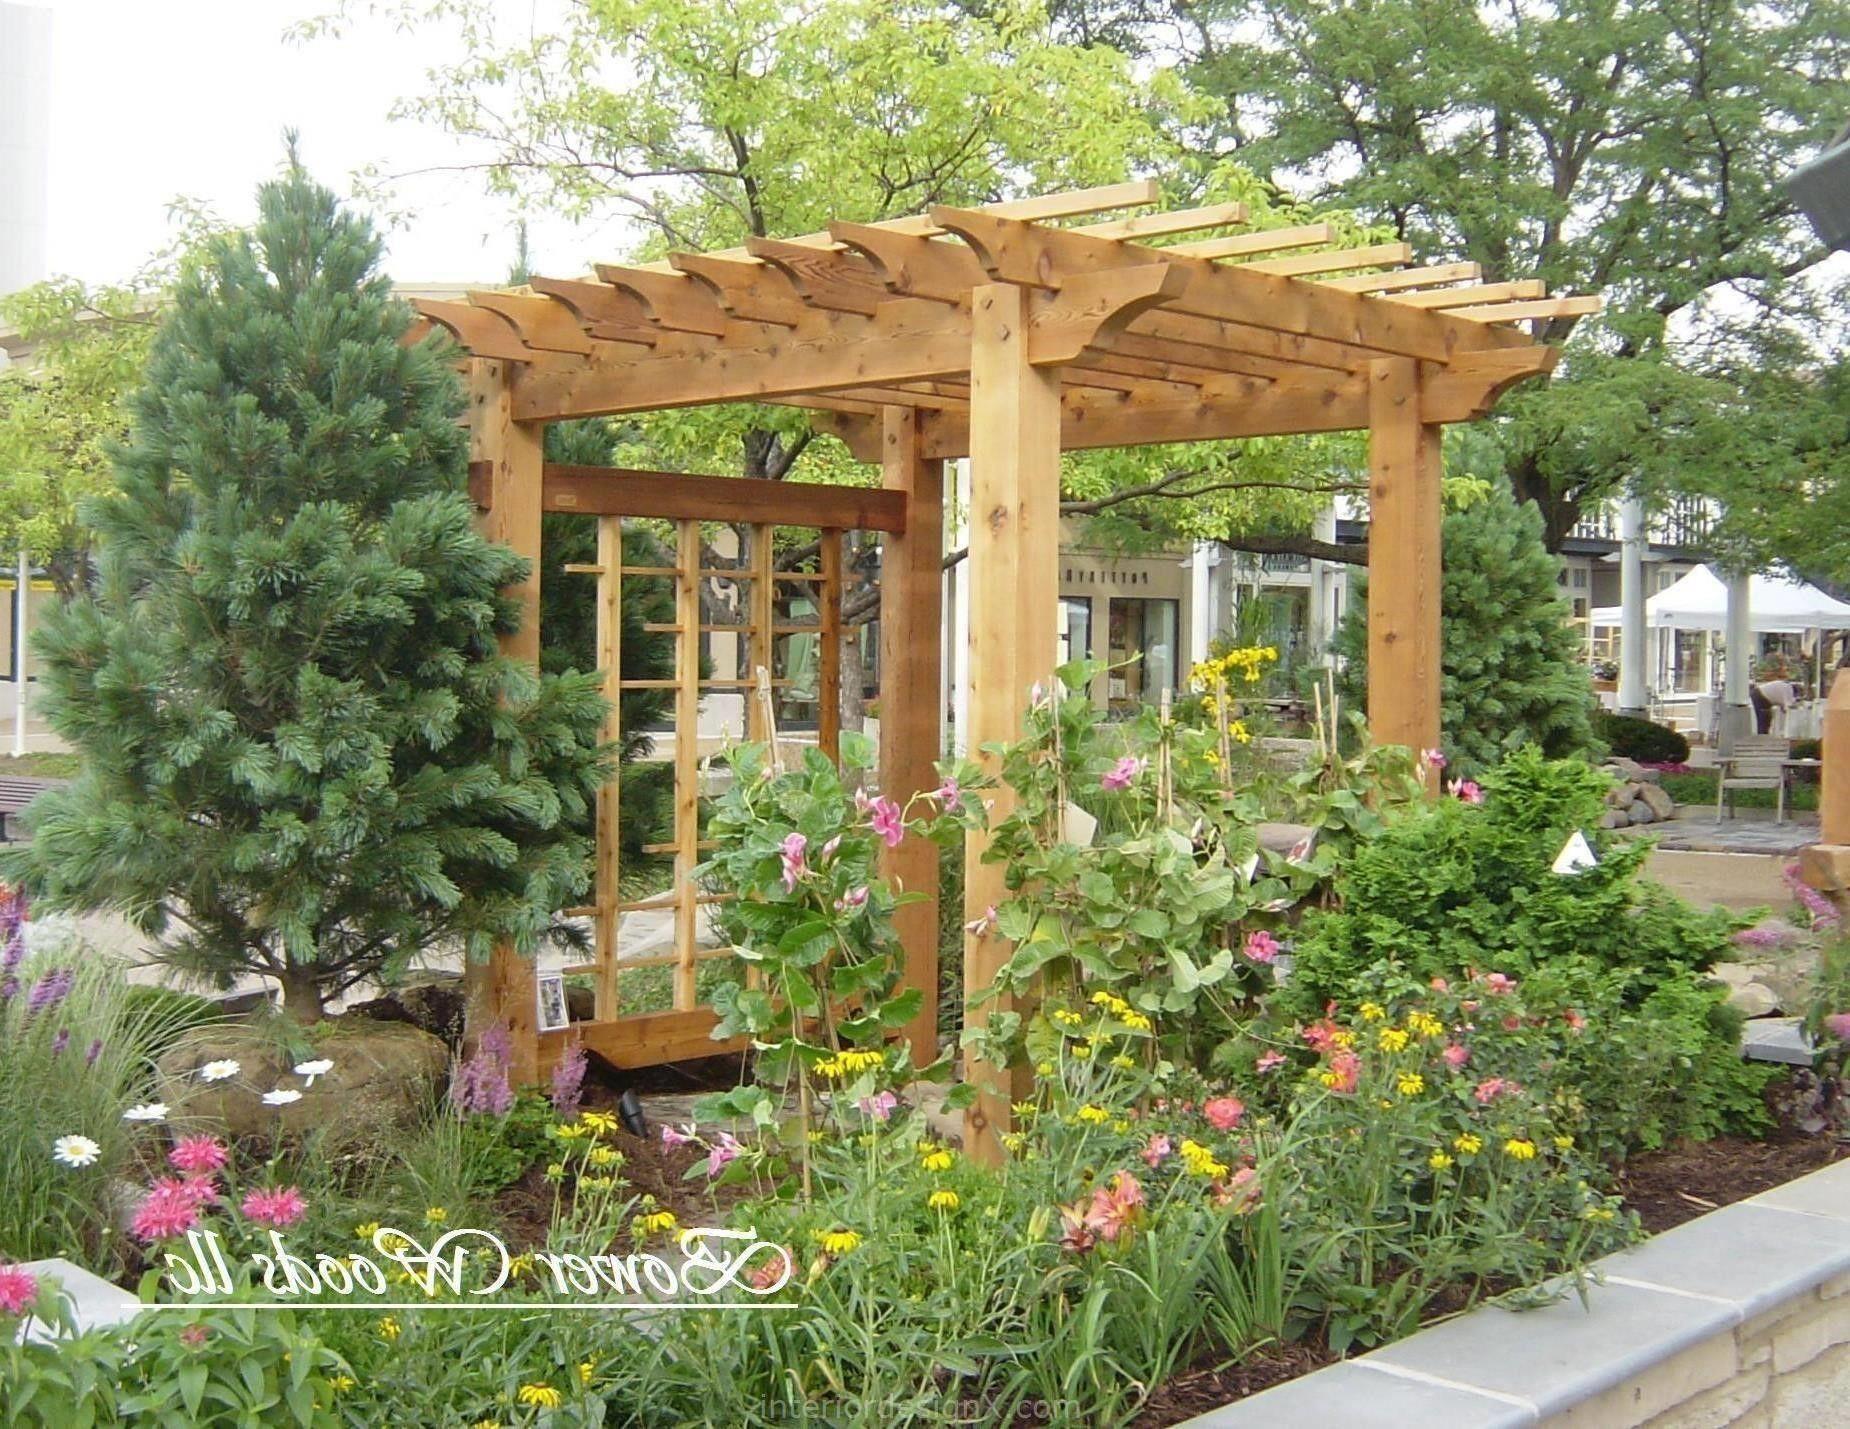 eddebacdadfccfe.jpg BACKYARD ARBOR DESIGN IDEAS Wooden Pergolas ...